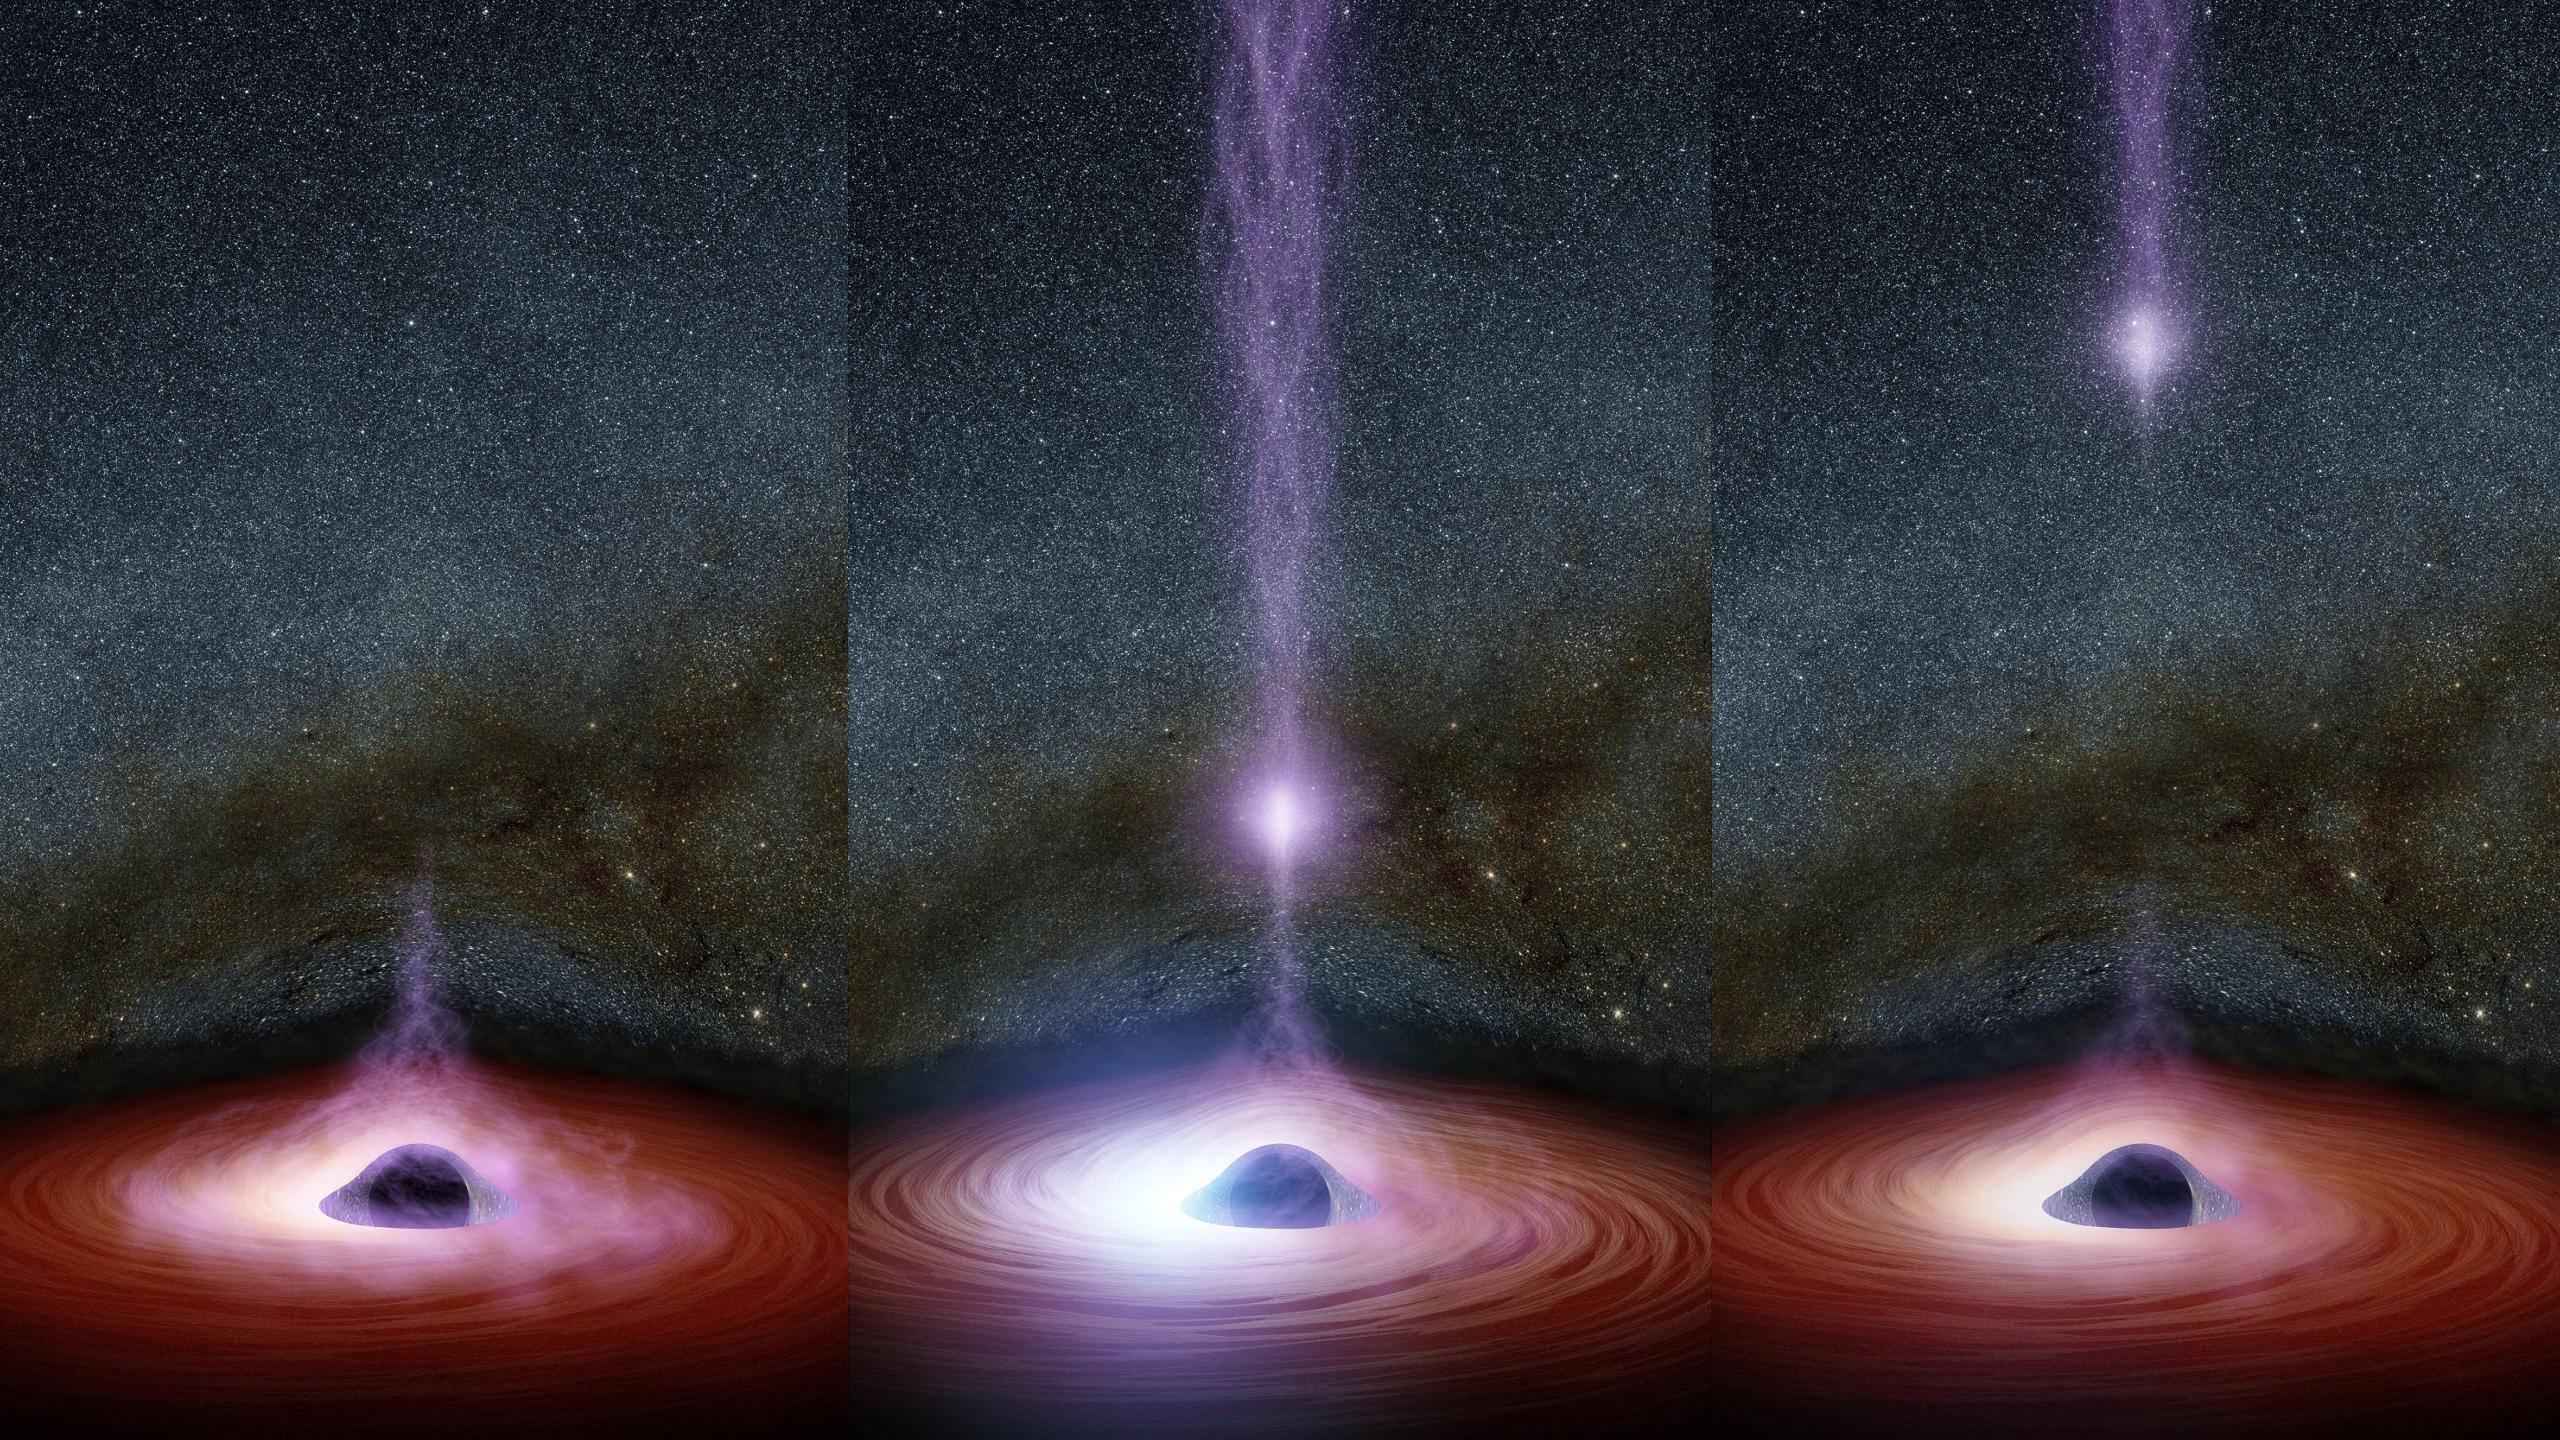 Nasa Black Hole Flare Images Hd Wallpaper